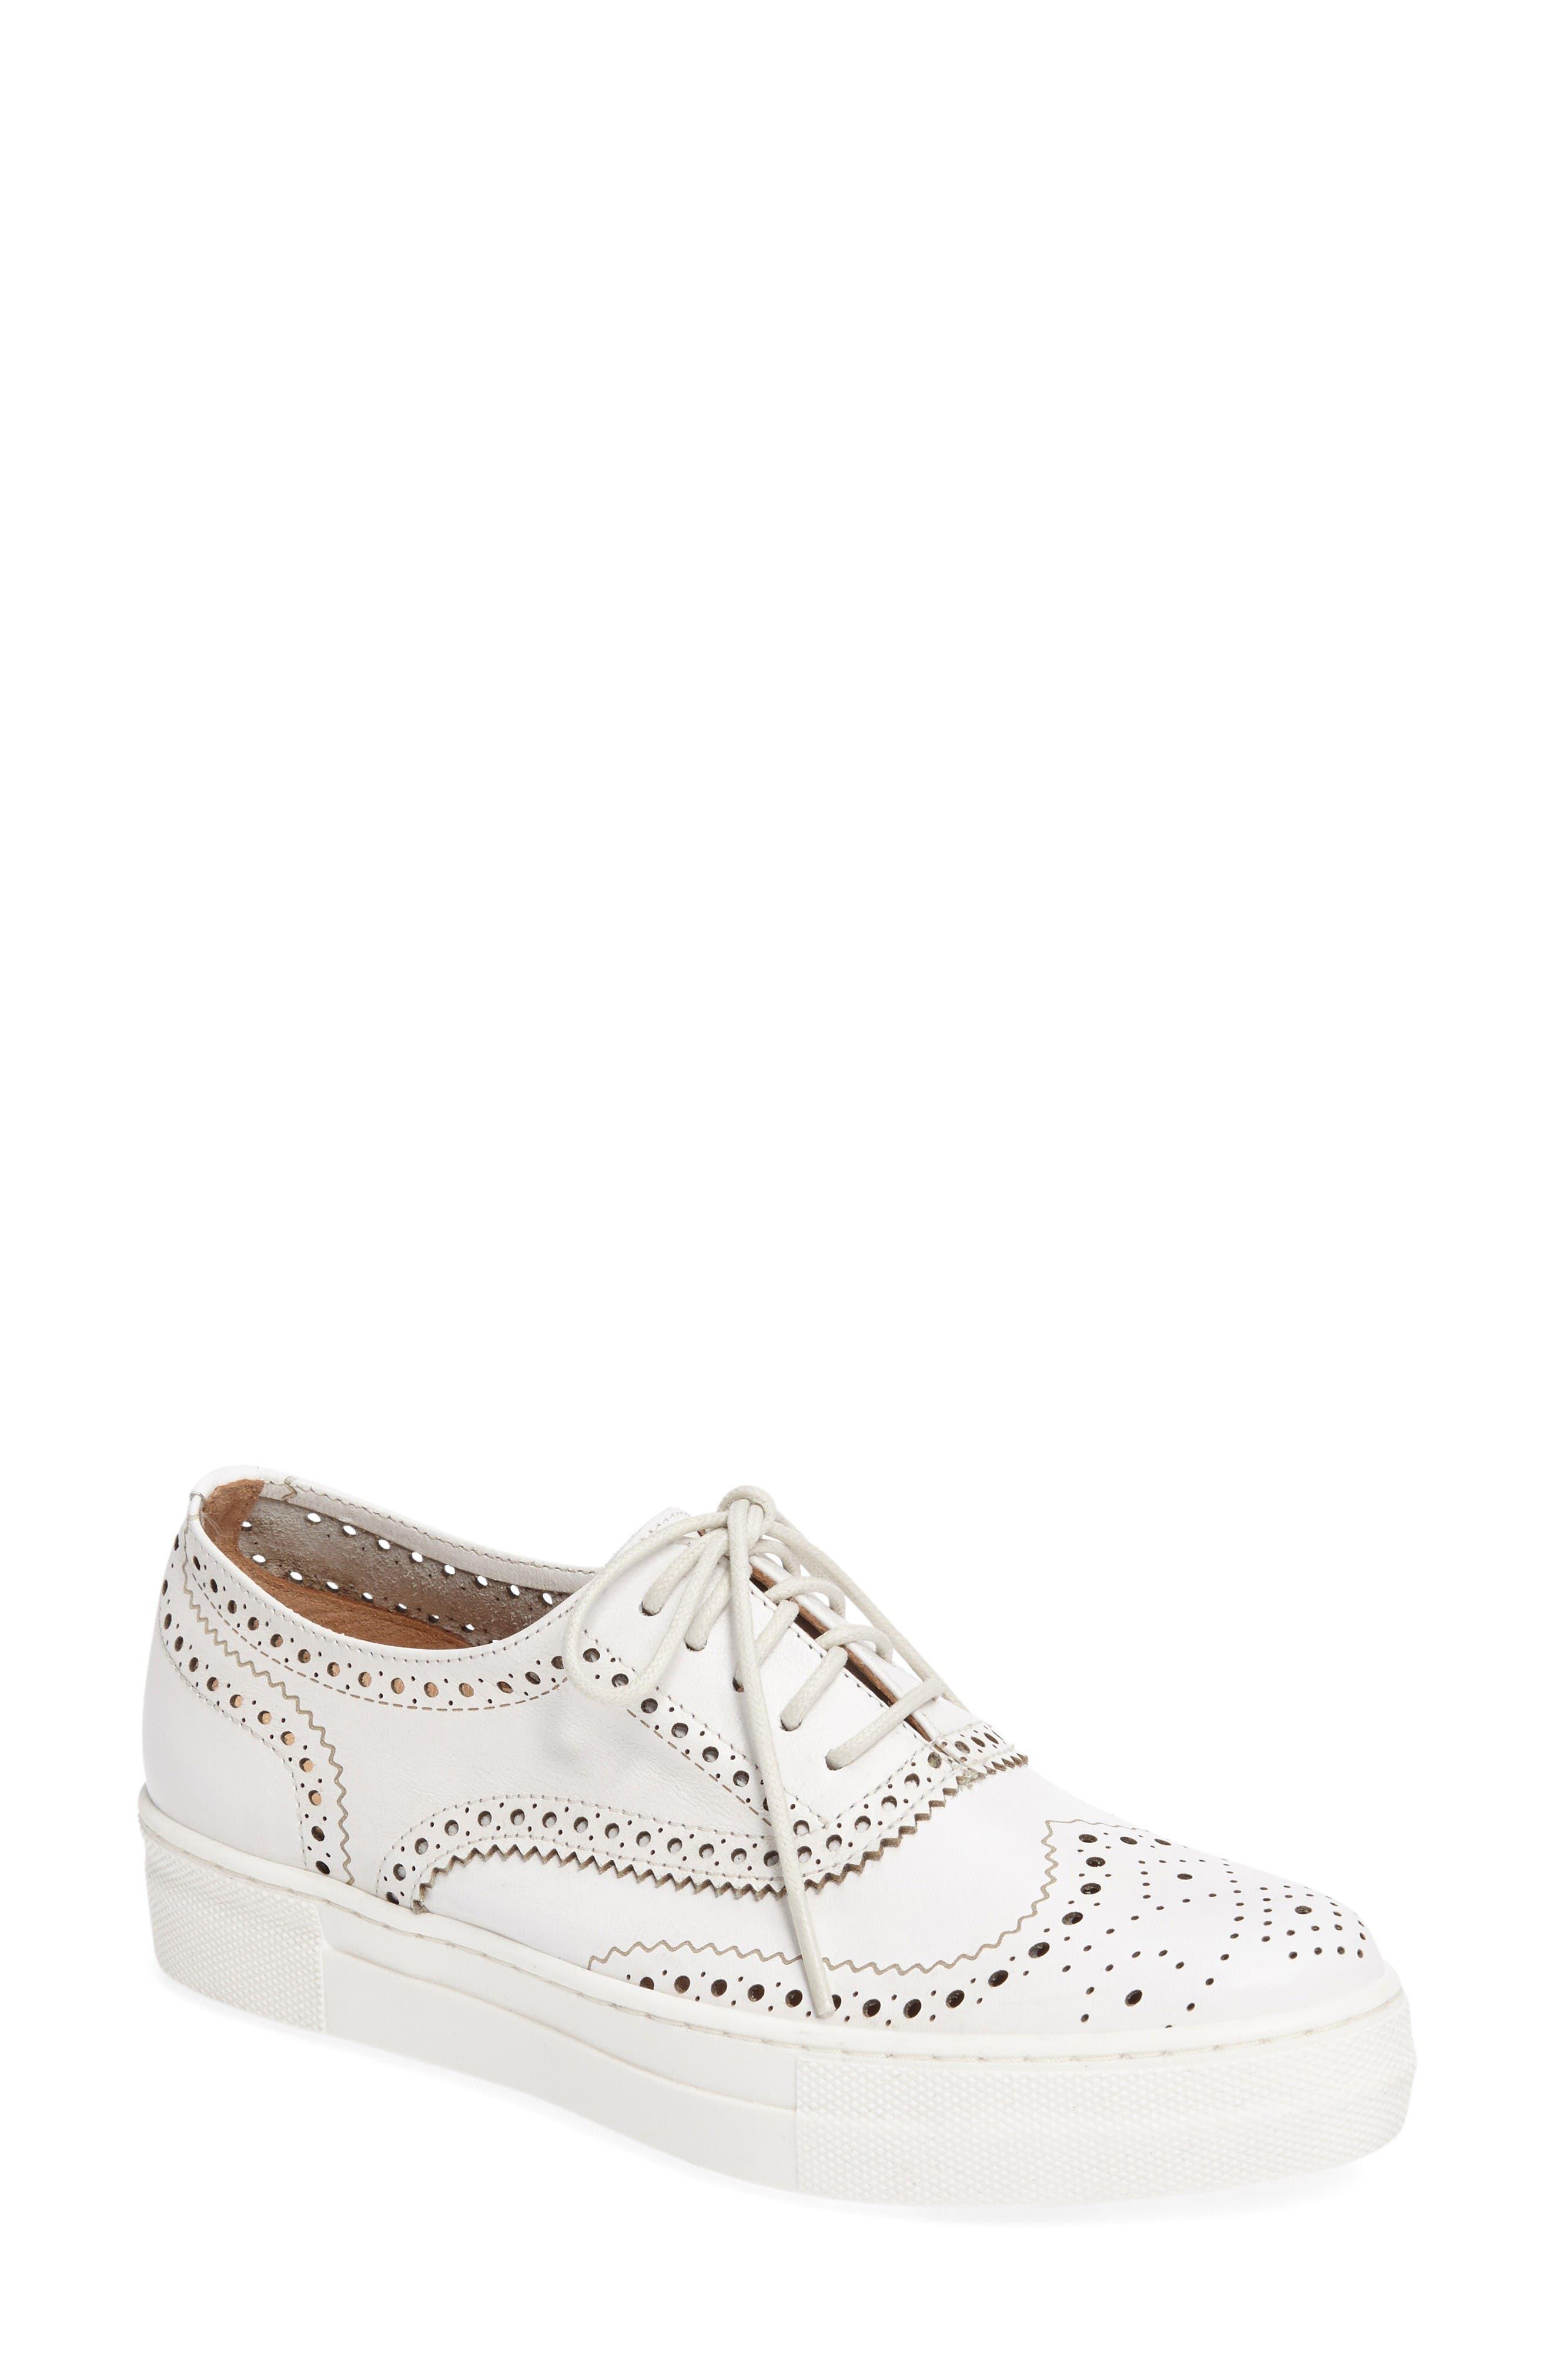 Shellys London Kimmie Perforated Platform Sneaker (Women)